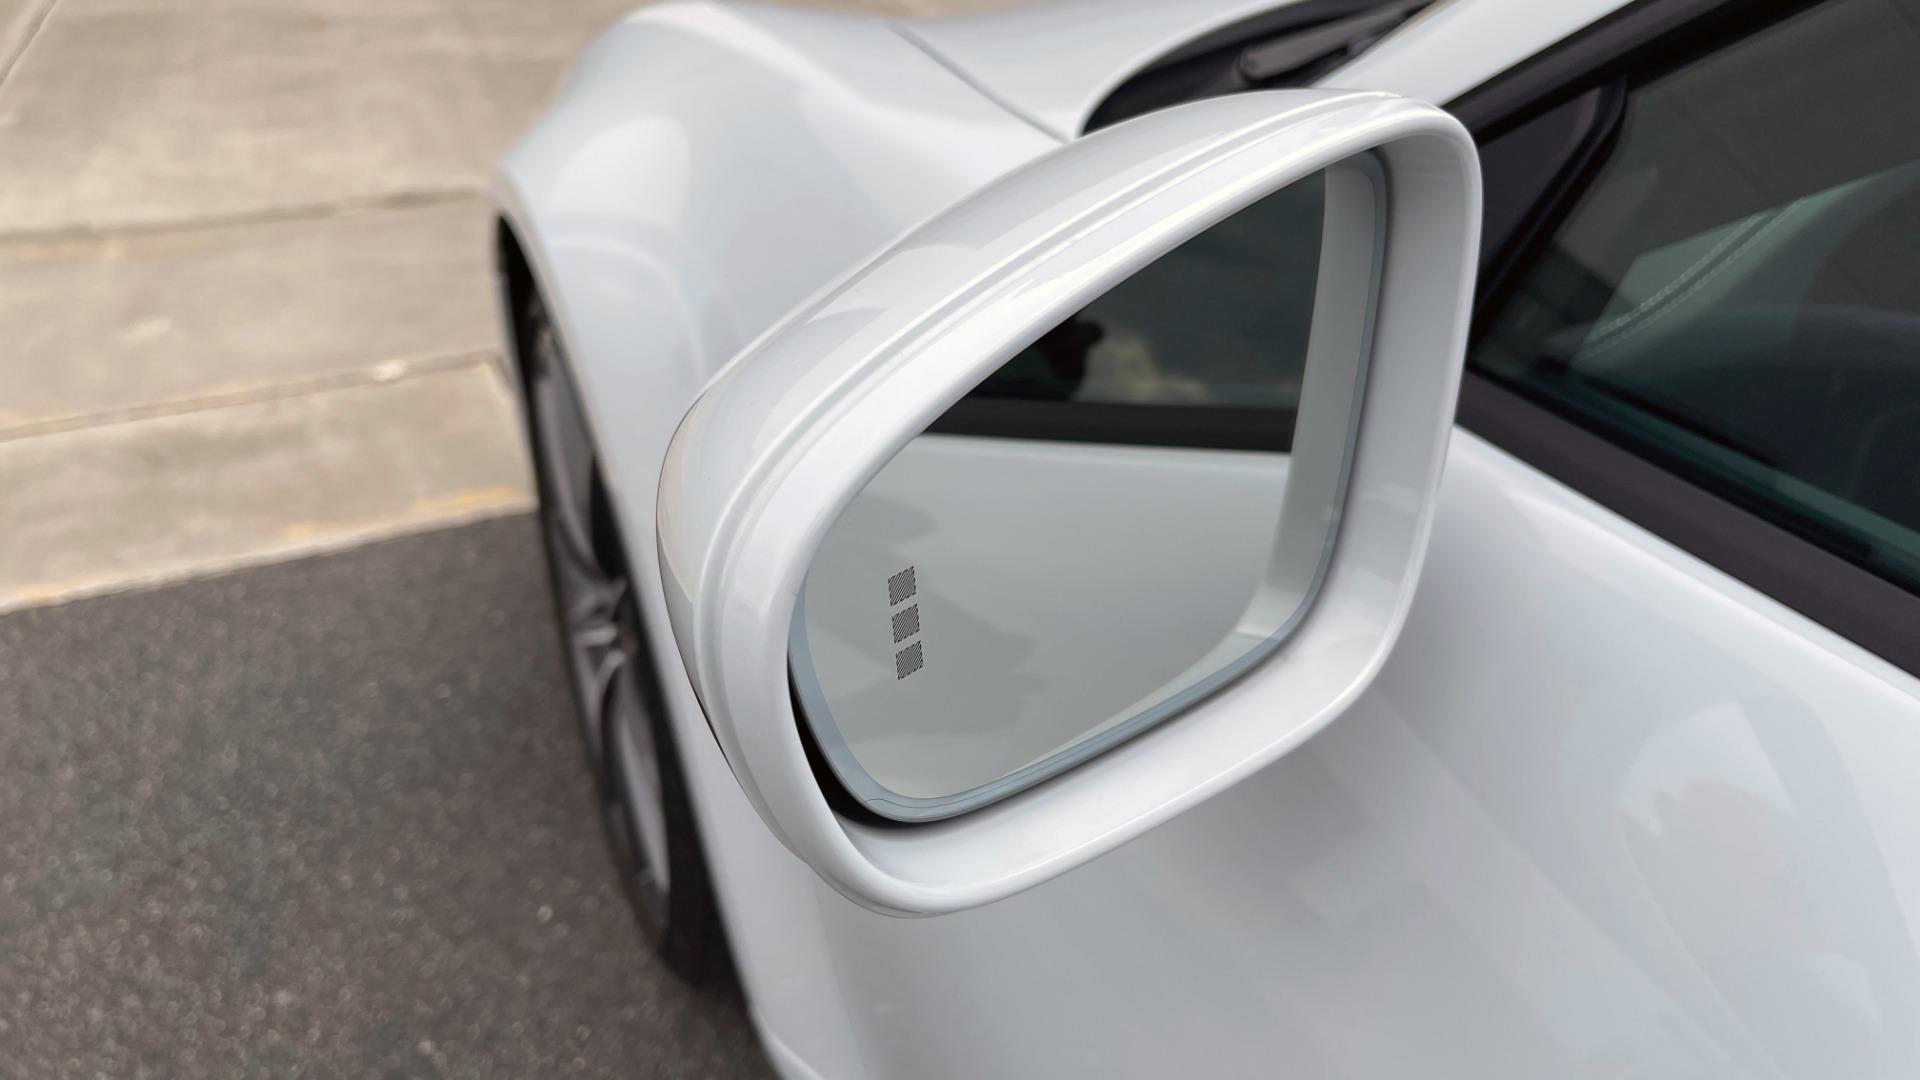 Used 2020 Porsche 911 CARRERA 4S CABRIOLET PREMIUM SPORT PKG / NAV / BOSE / LIGHT DESIGN PKG for sale $167,595 at Formula Imports in Charlotte NC 28227 37